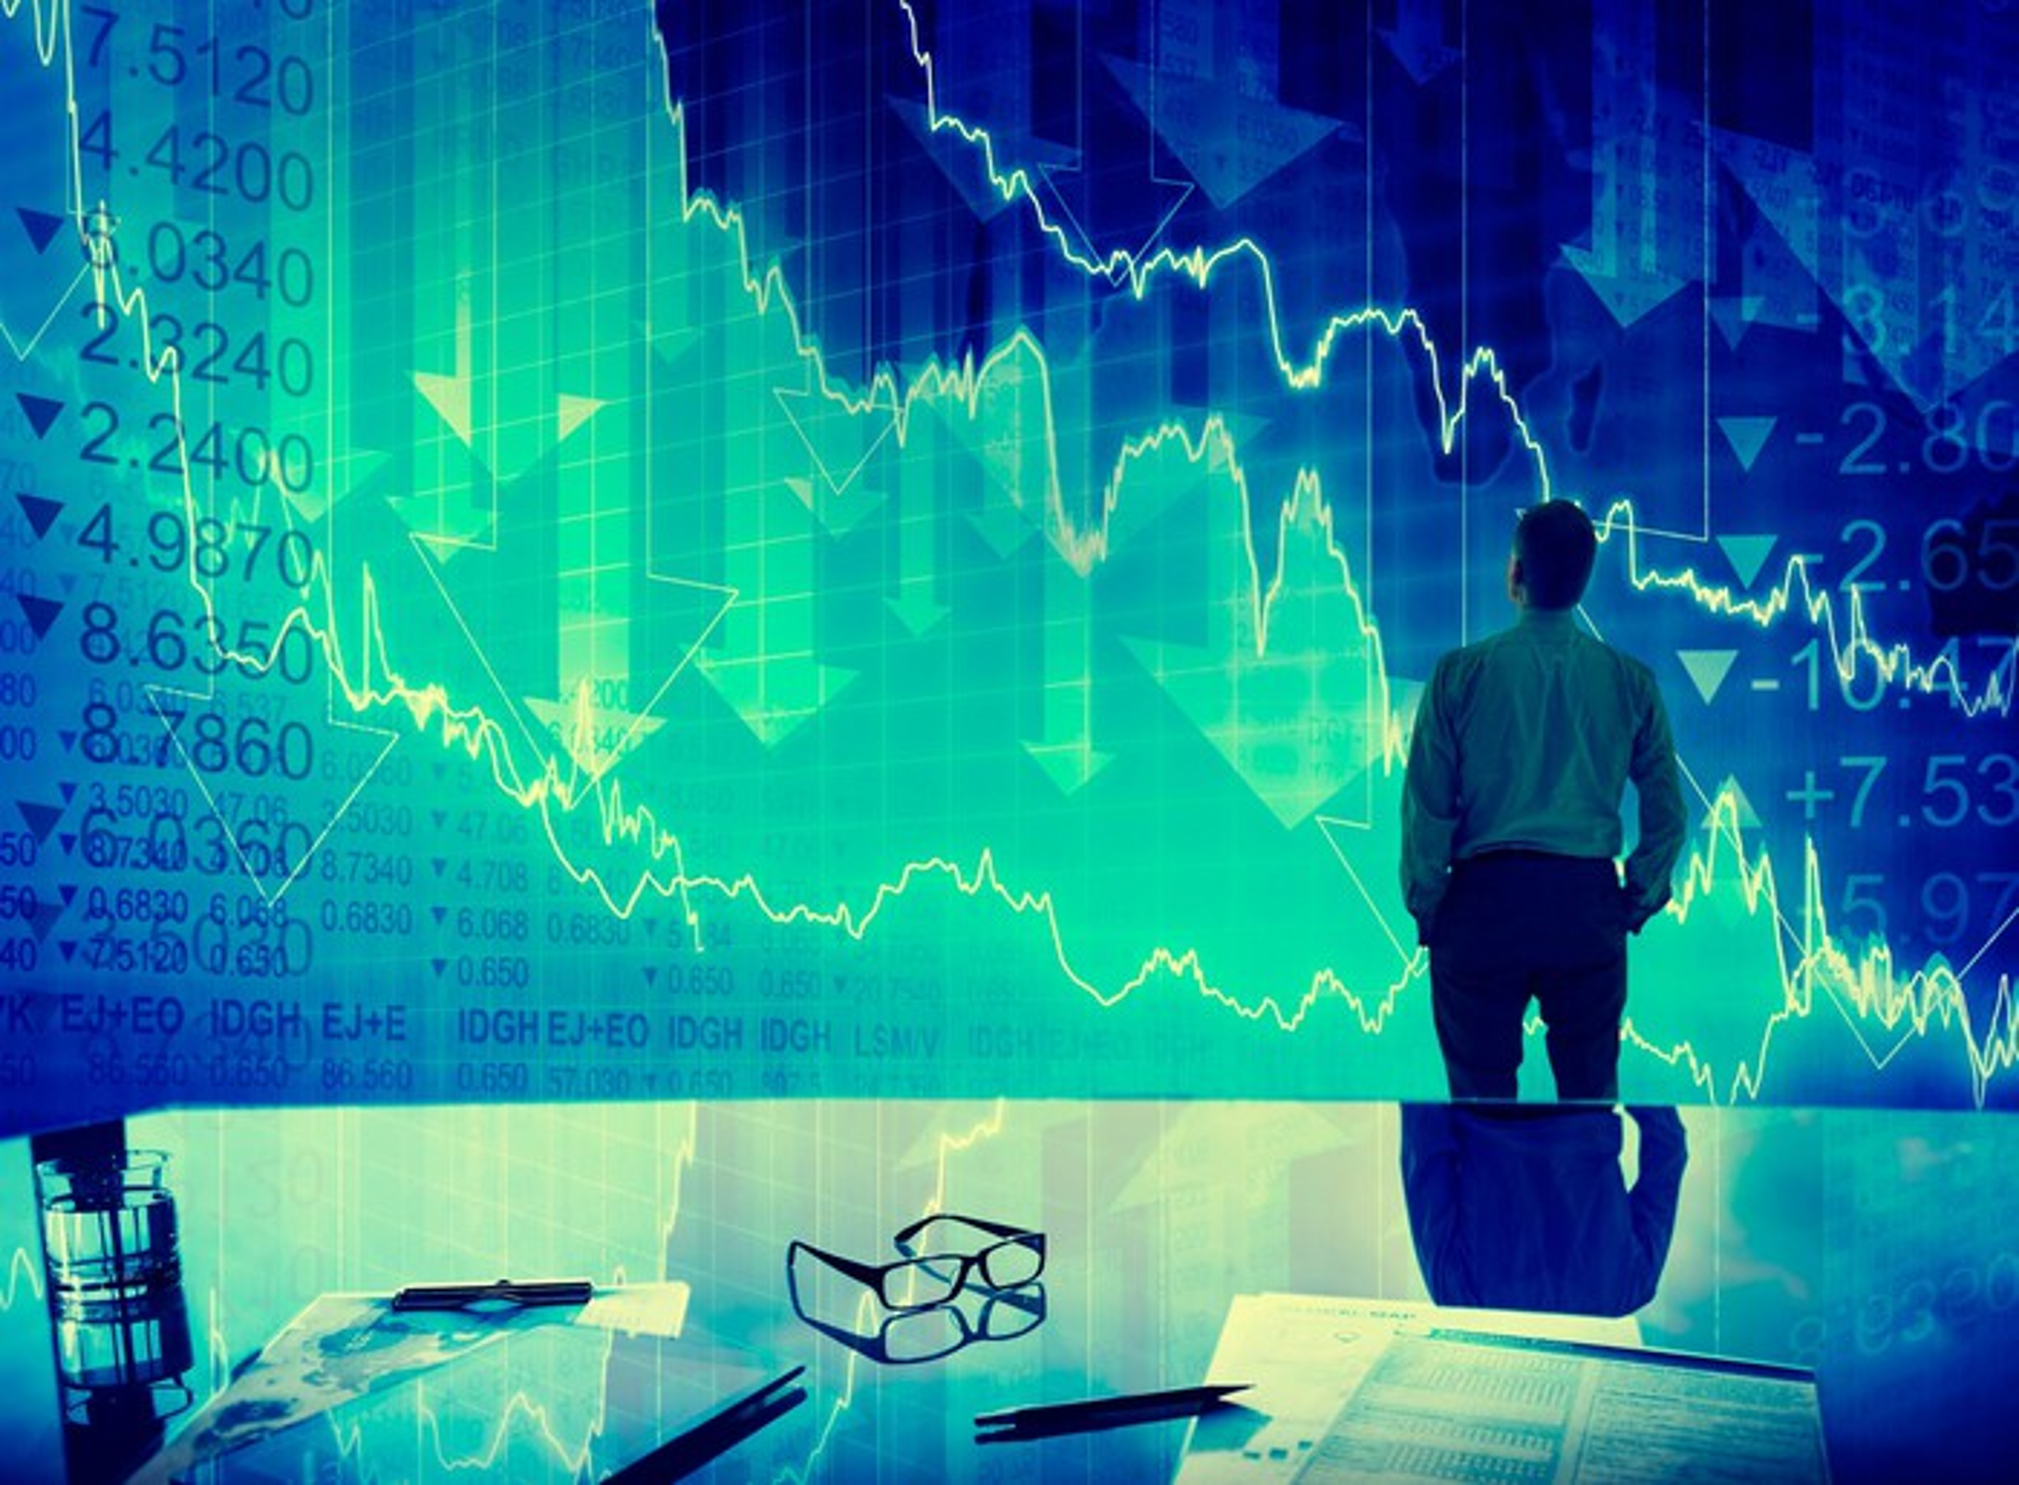 Man watching stock charts go down.